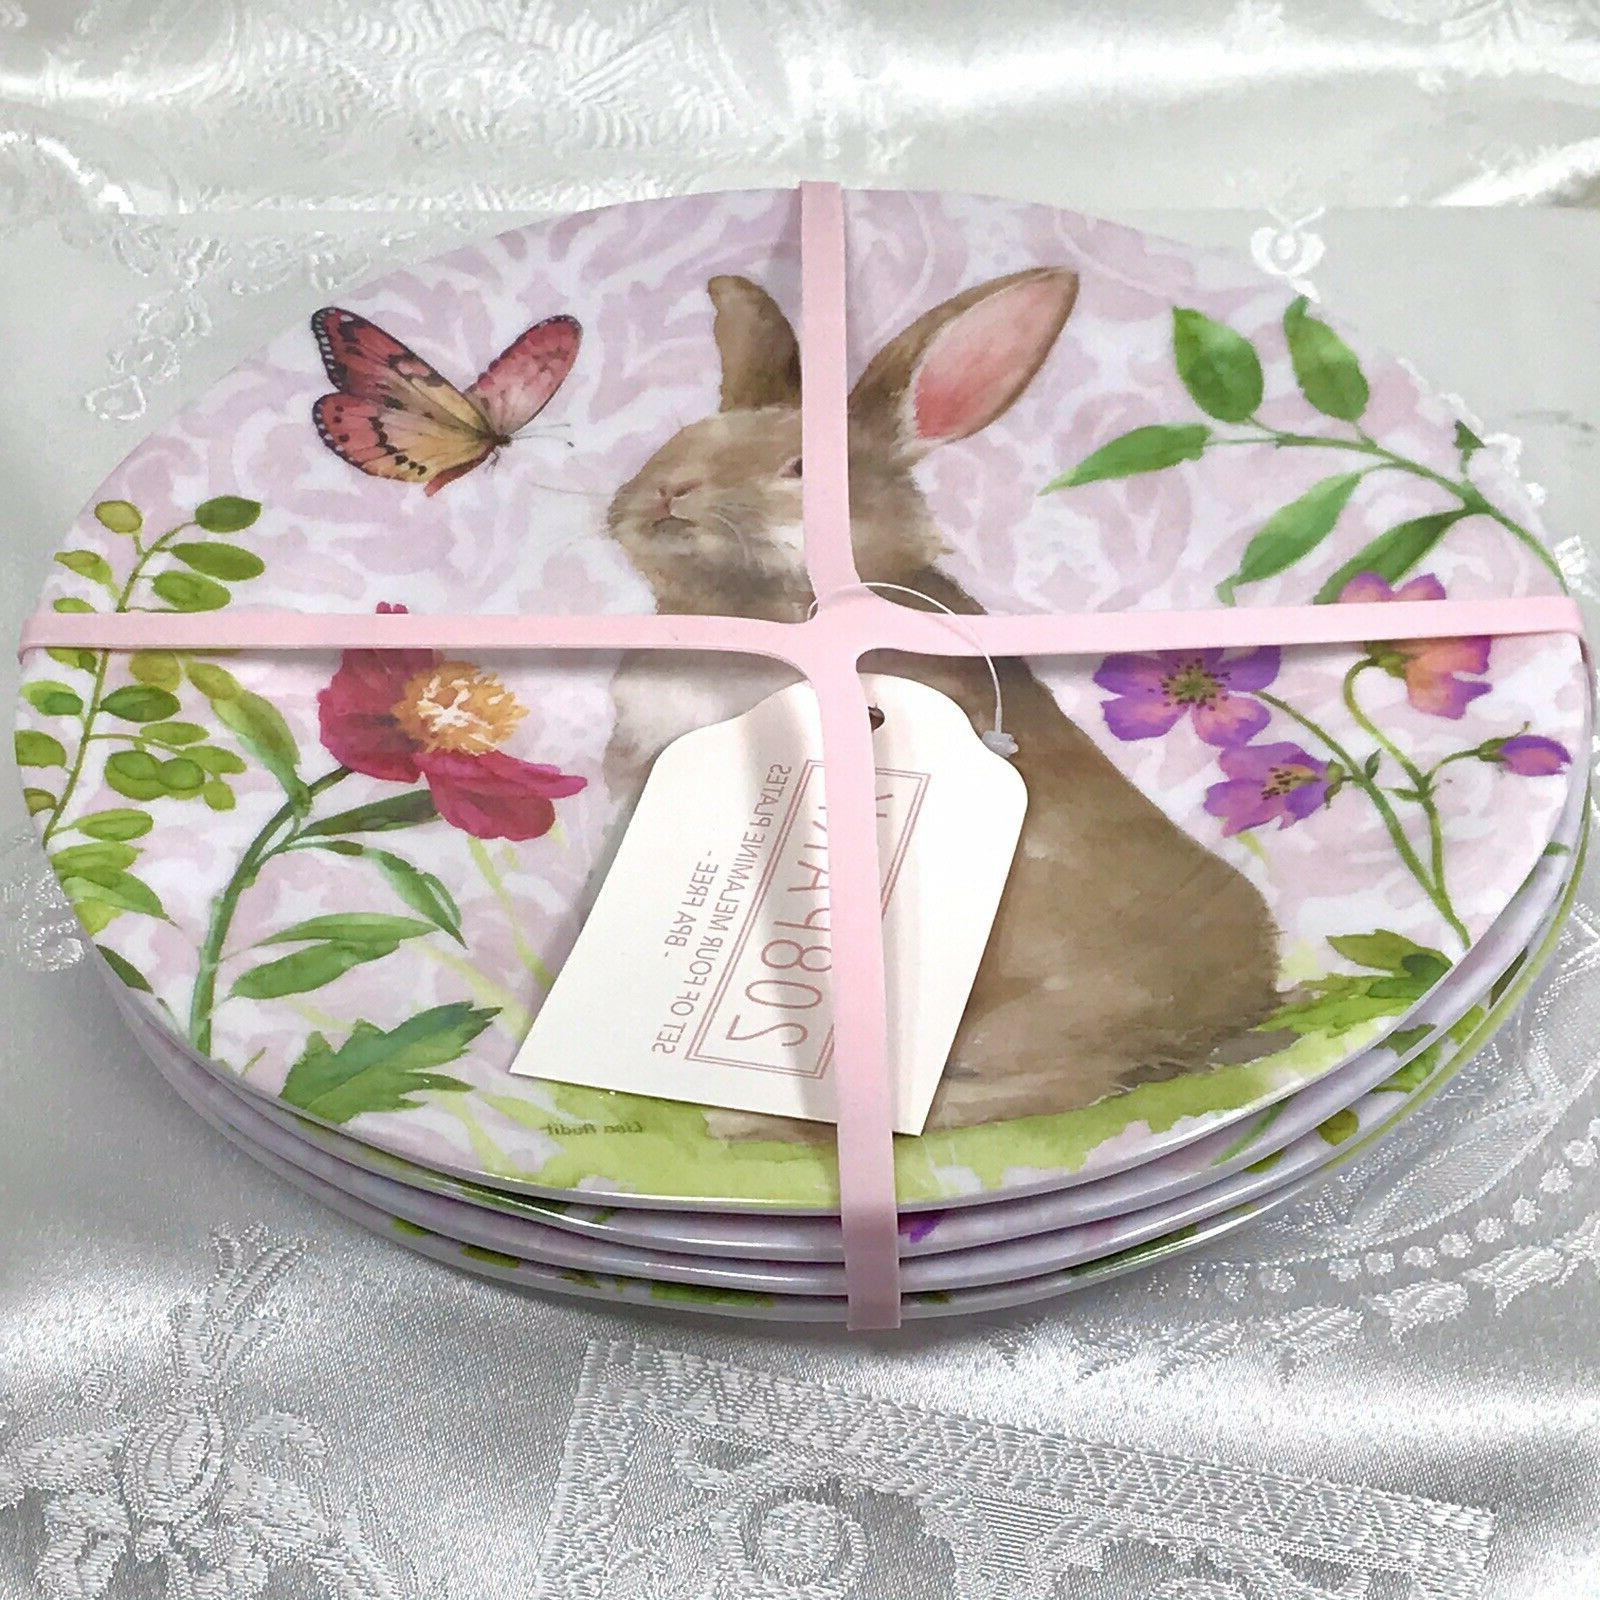 "208 Park Easter Softies"" Salad x BPA Free"